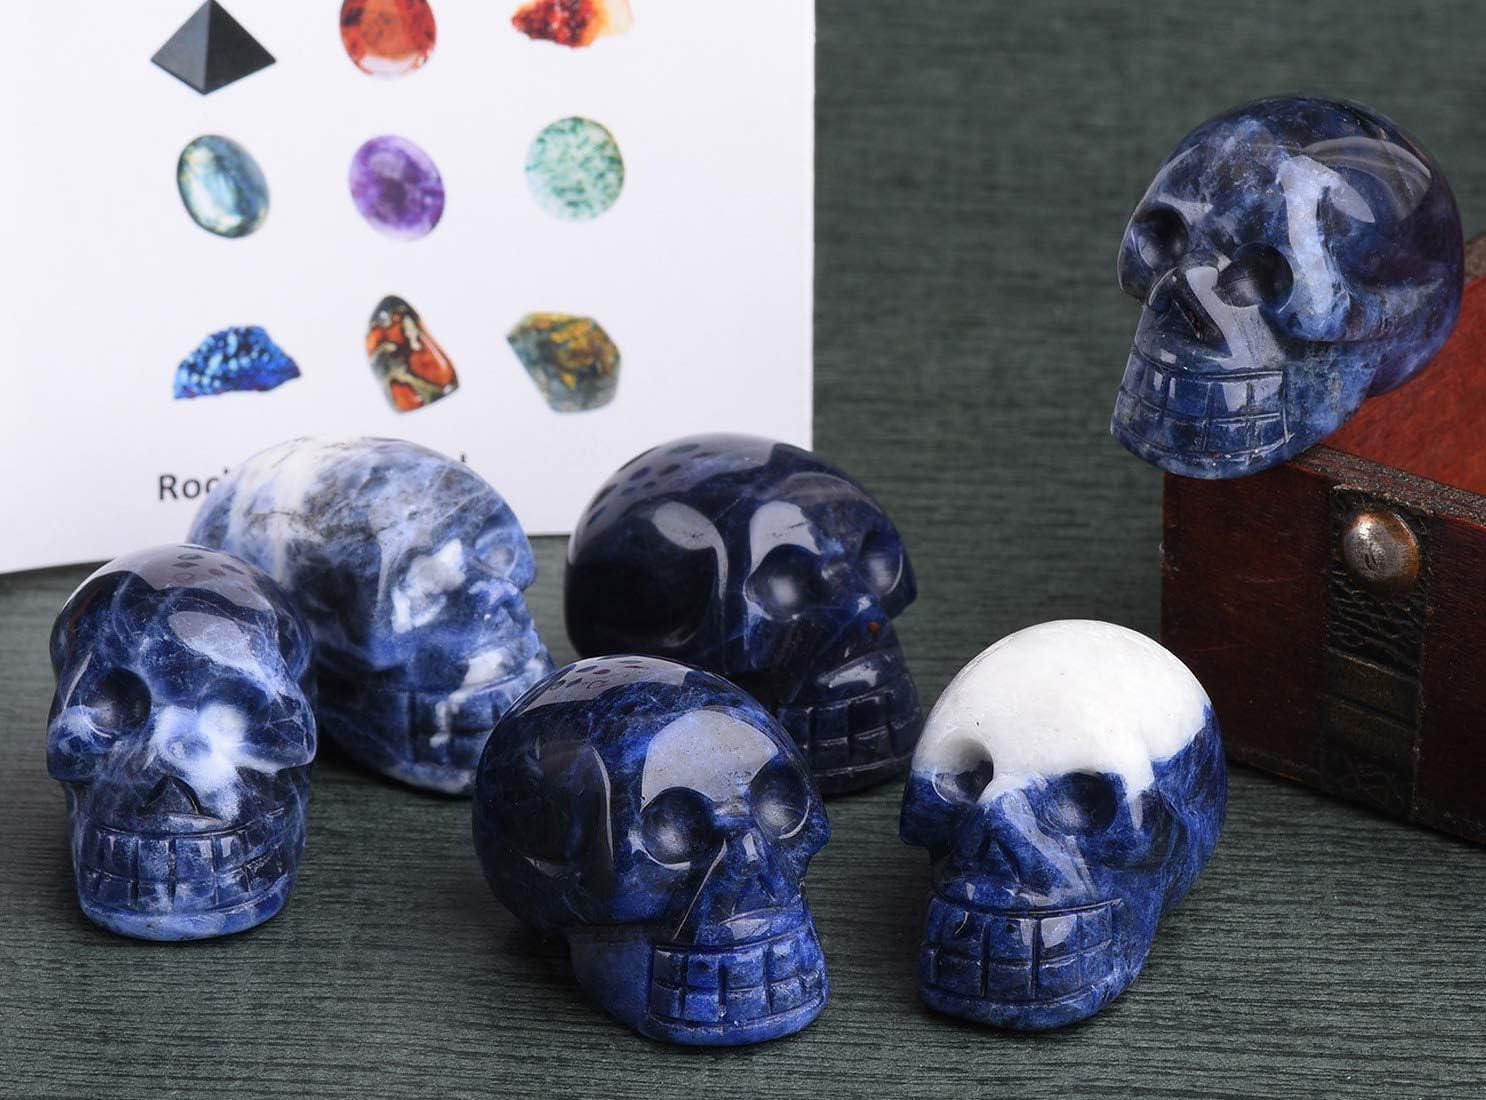 JIC Gem Sodalite Carving Skull Stone Pocket Statue Figurine Decor Natural Healing Crystal Pack of 6